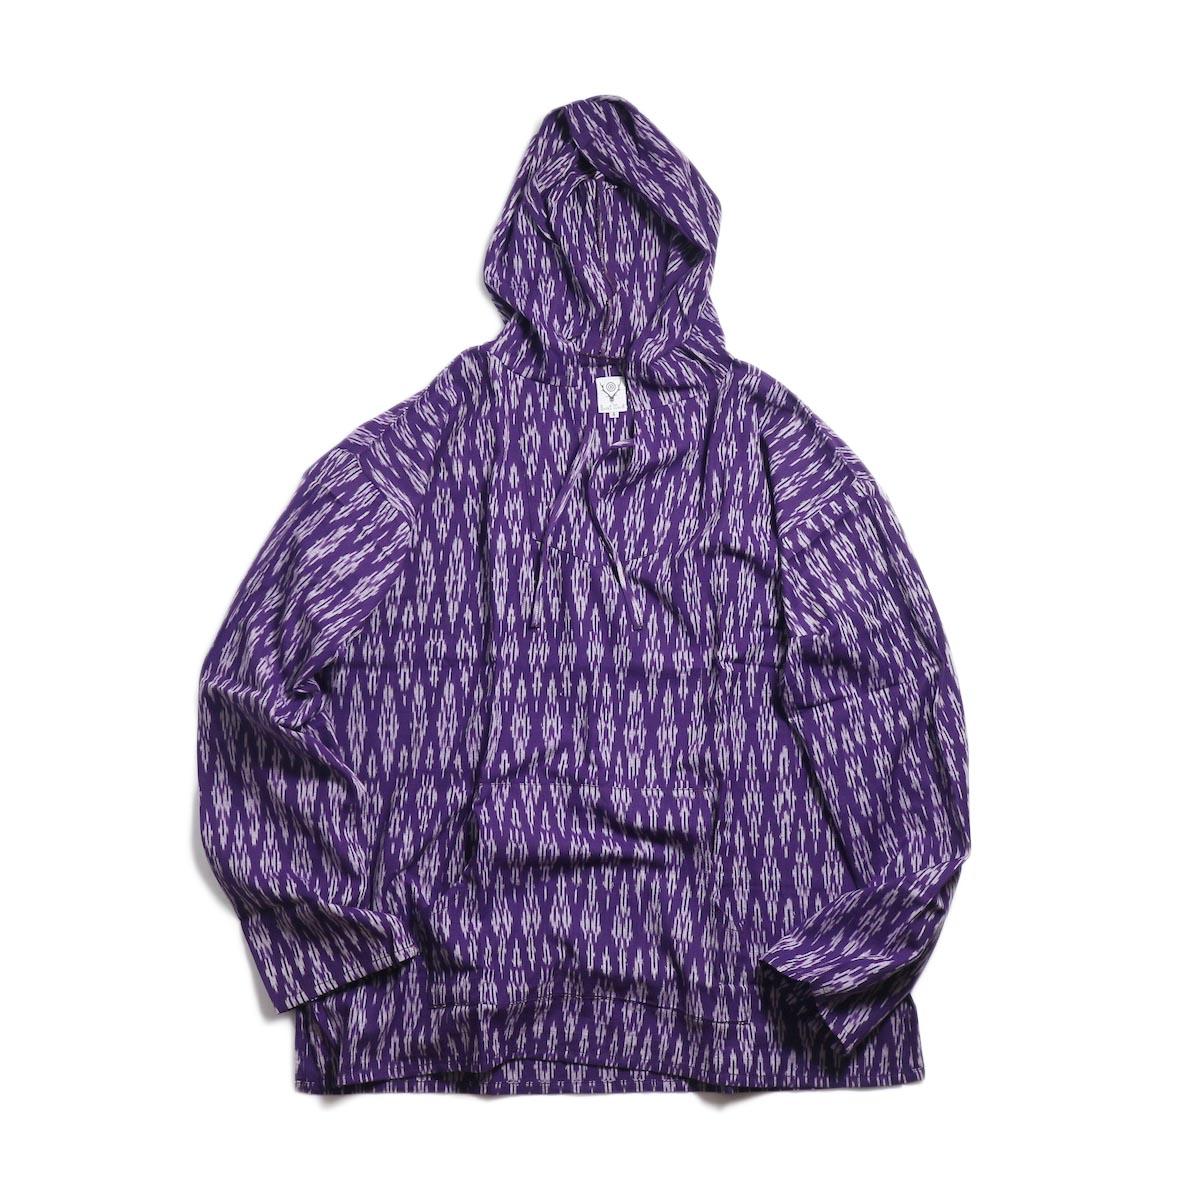 SOUTH2 WEST8 / Mexican Parka -Cotton Cloth / Splashed Pattern (Purple)